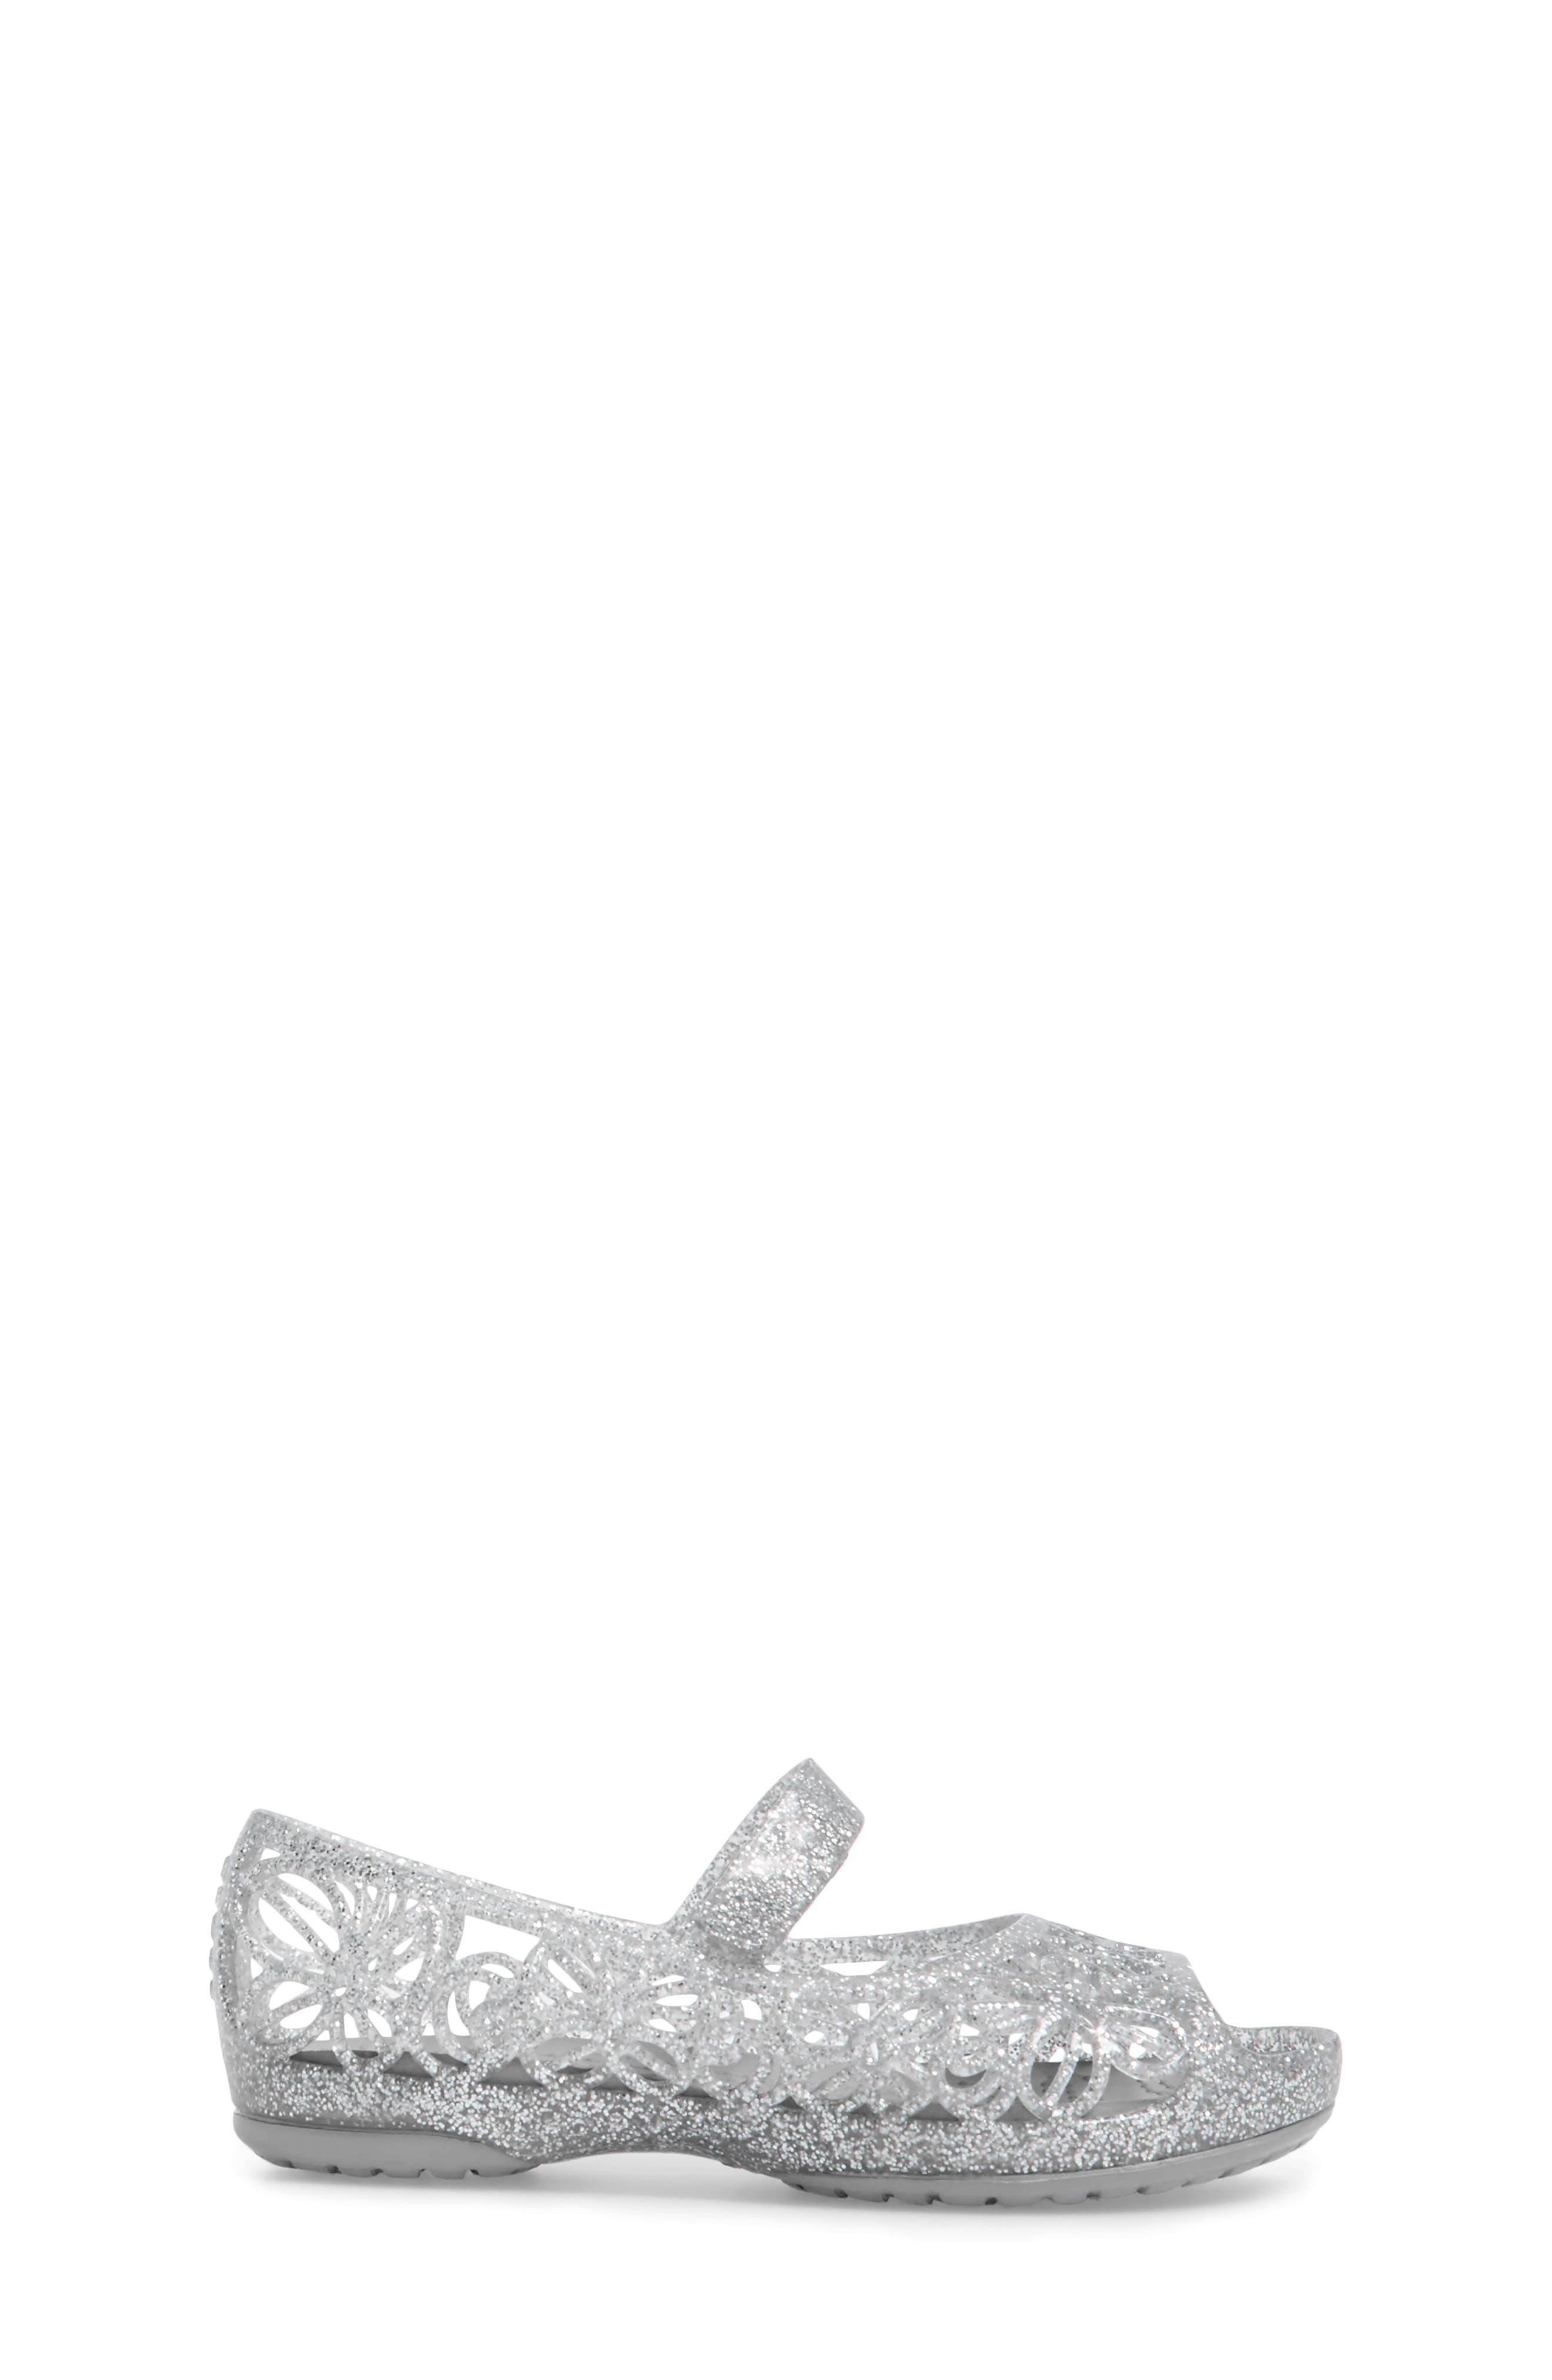 'Isabella' Jelly Flat,                             Alternate thumbnail 3, color,                             040